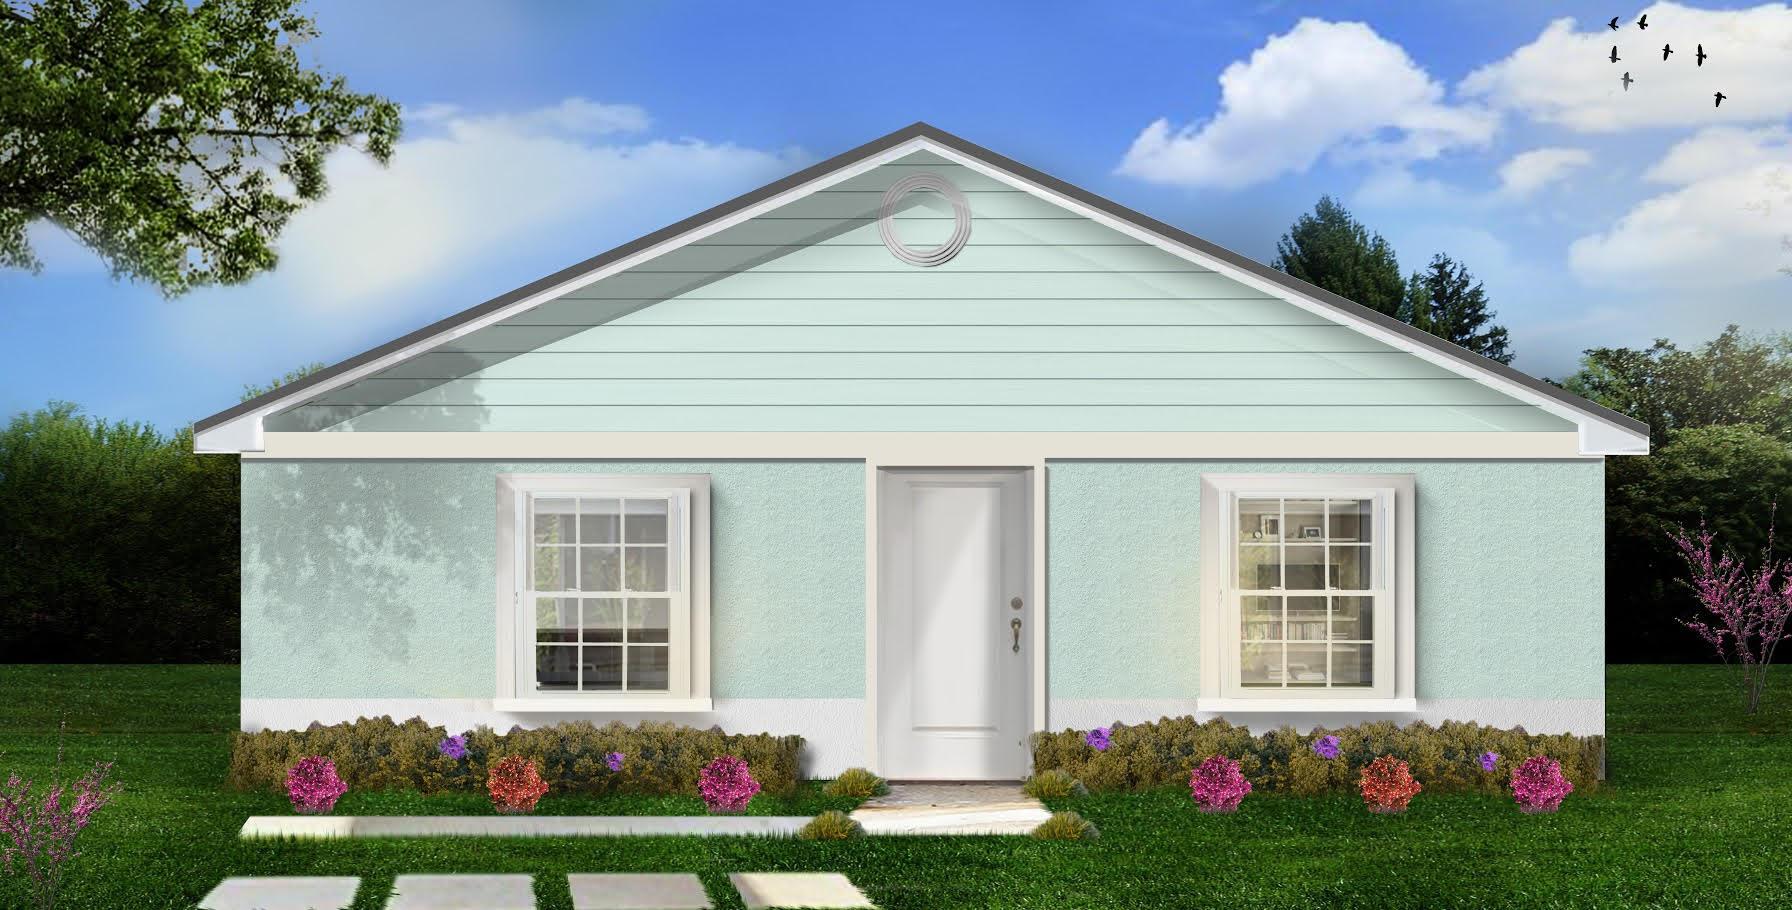 Details for 525 Lilac Court, West Palm Beach, FL 33407